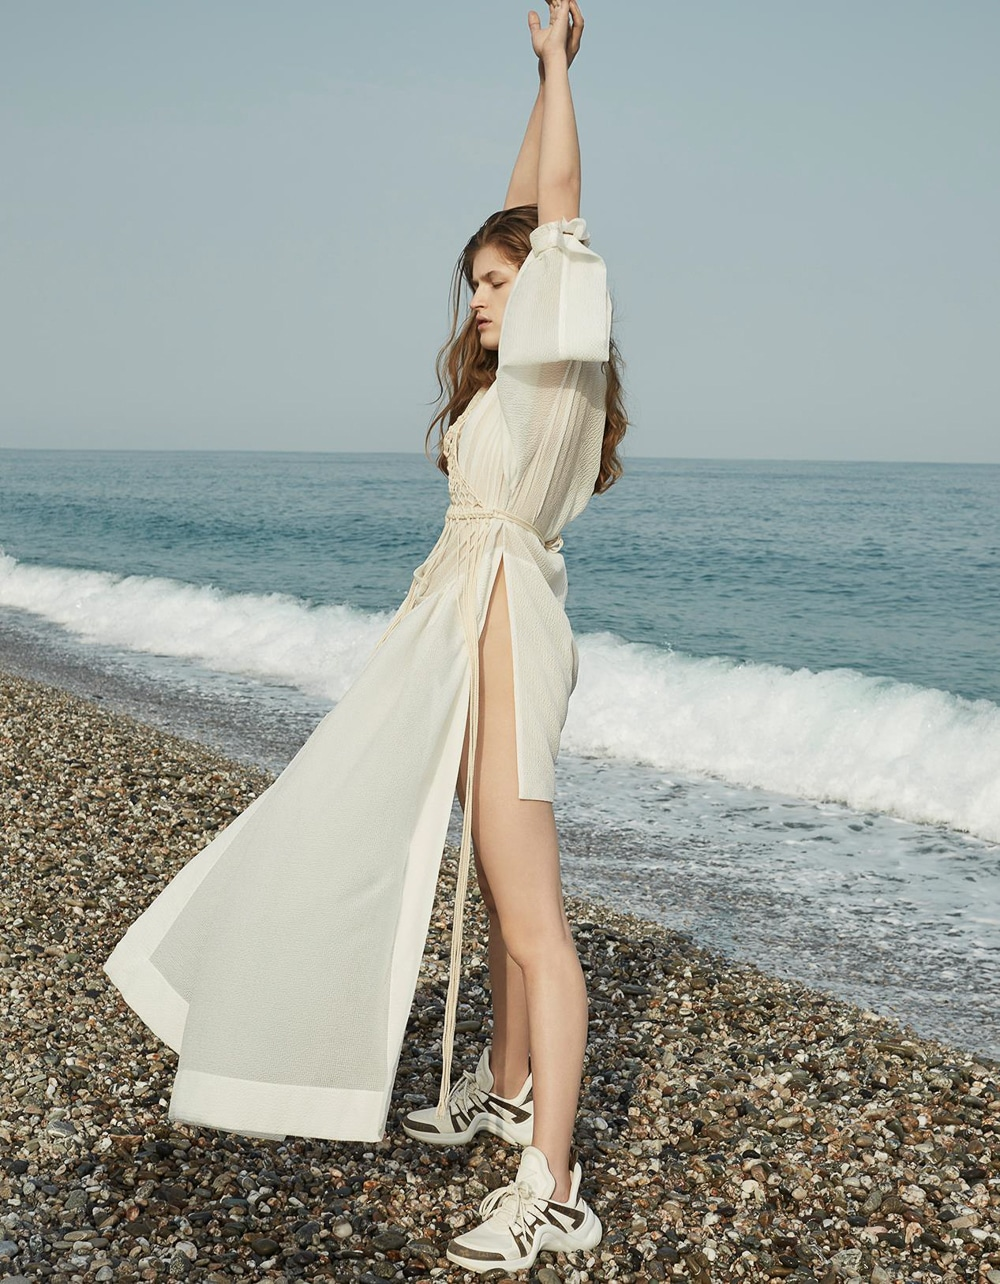 Vogue-Poland-Molly-Smith-Agata-Pospieszynska-14.jpg